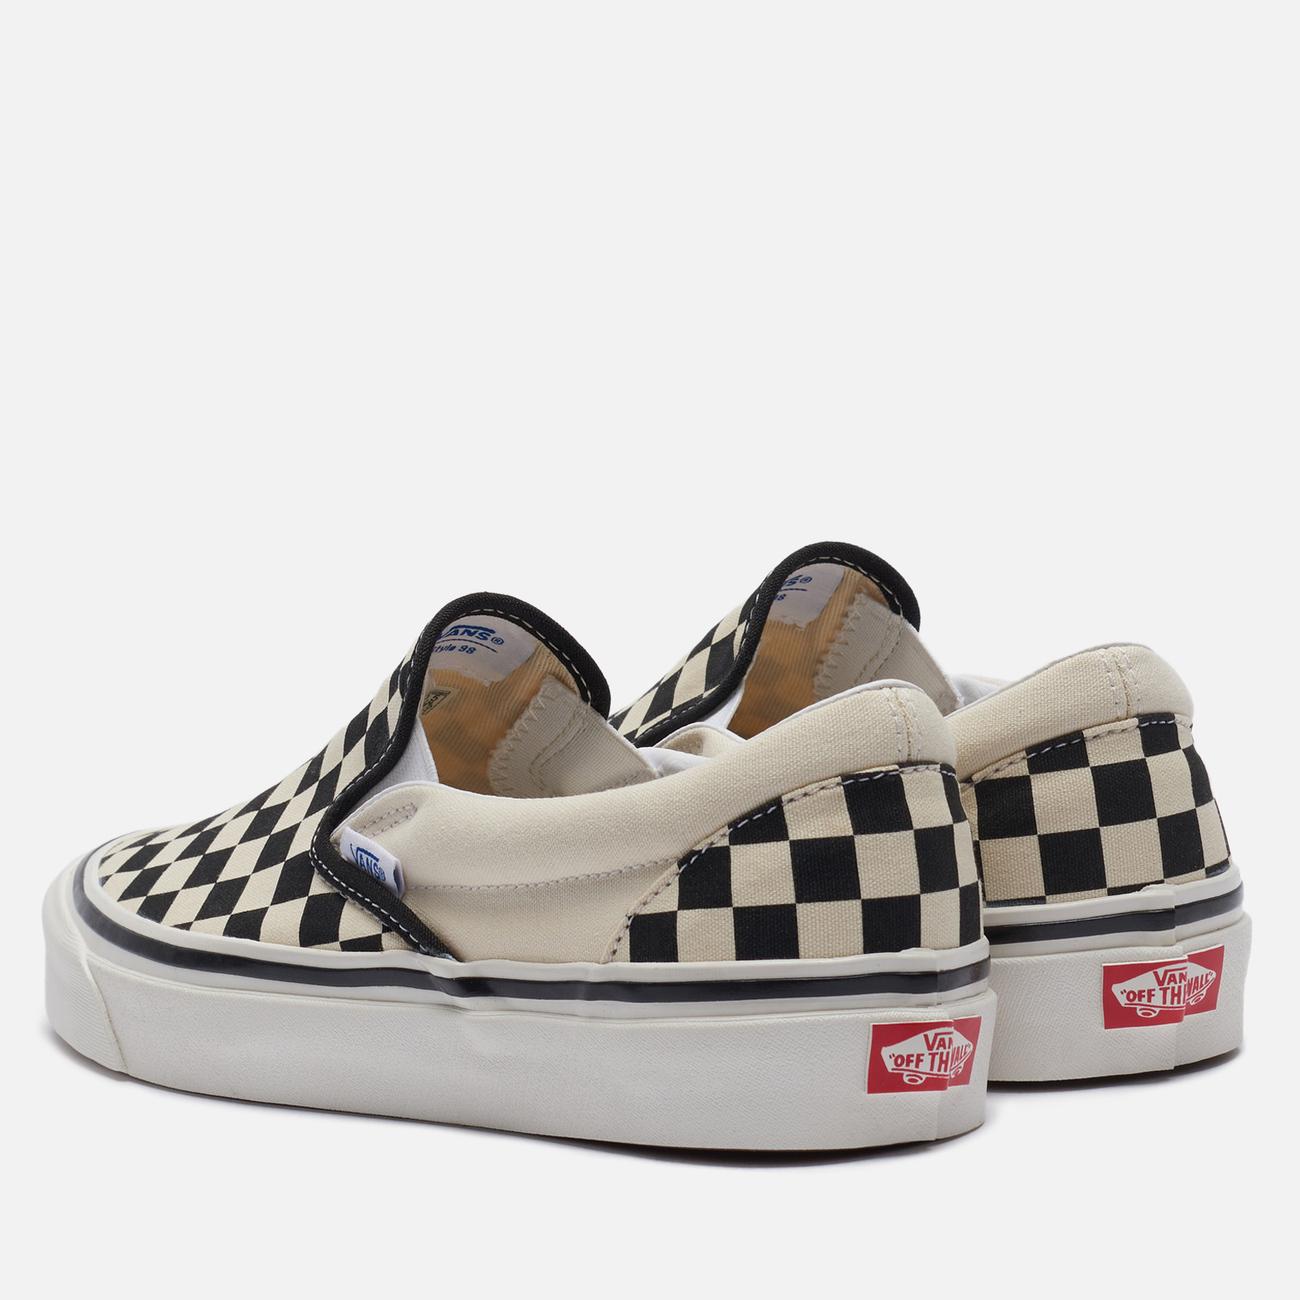 Мужские кеды Vans Classic Slip-On 98 DX Anaheim Factory Checkerboard/Black/White